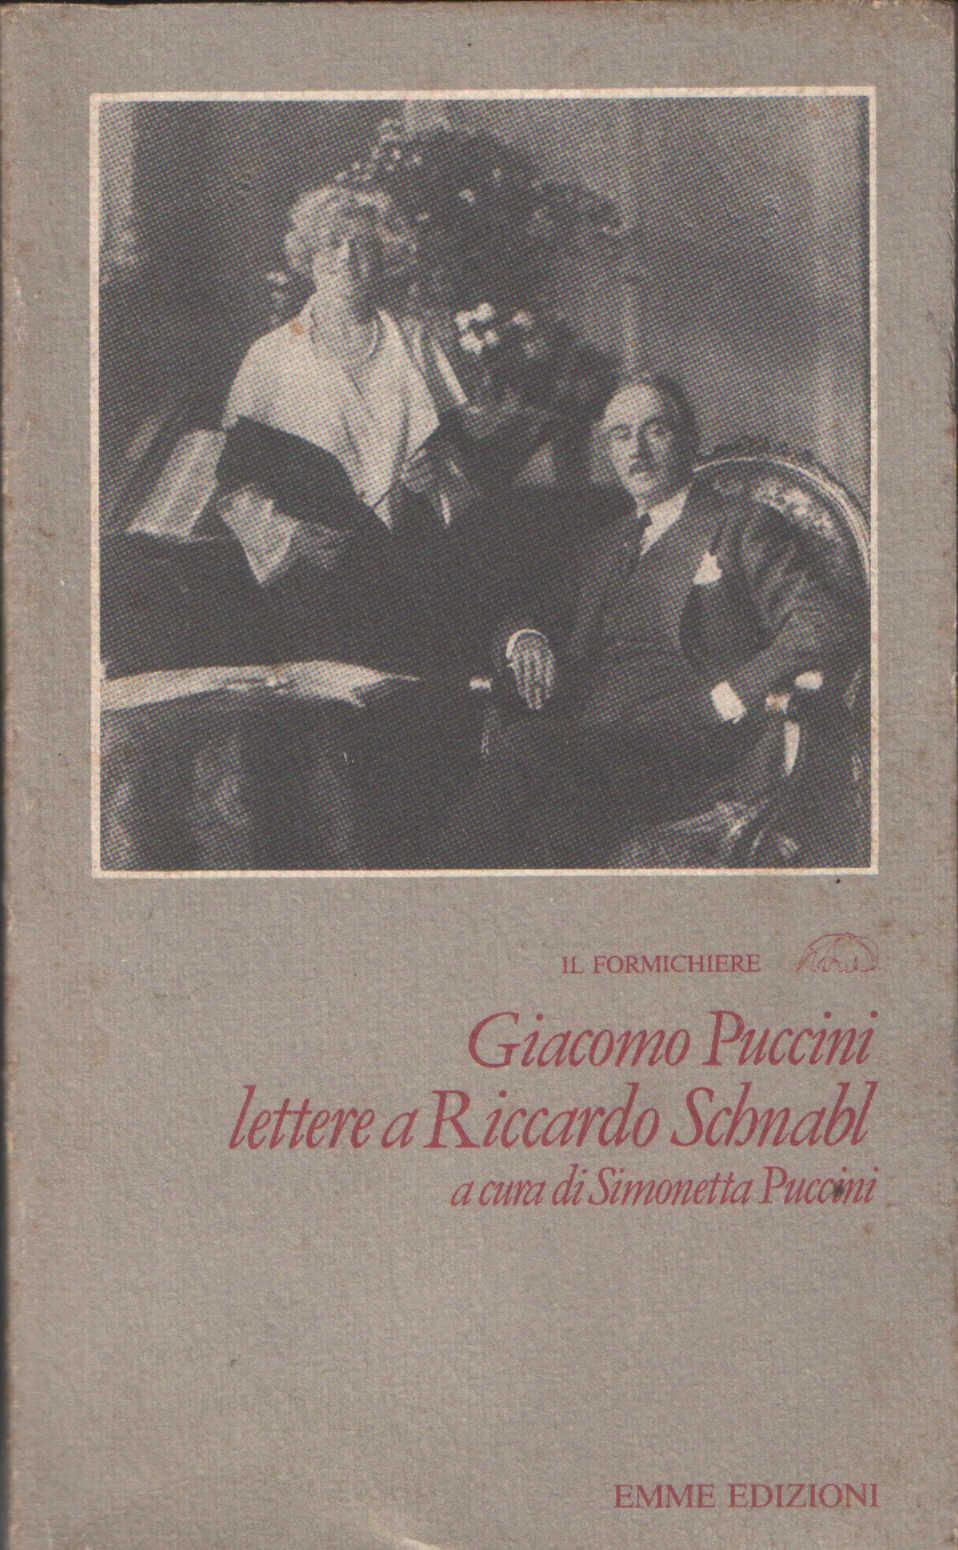 Lettere a Riccardo Schnabl